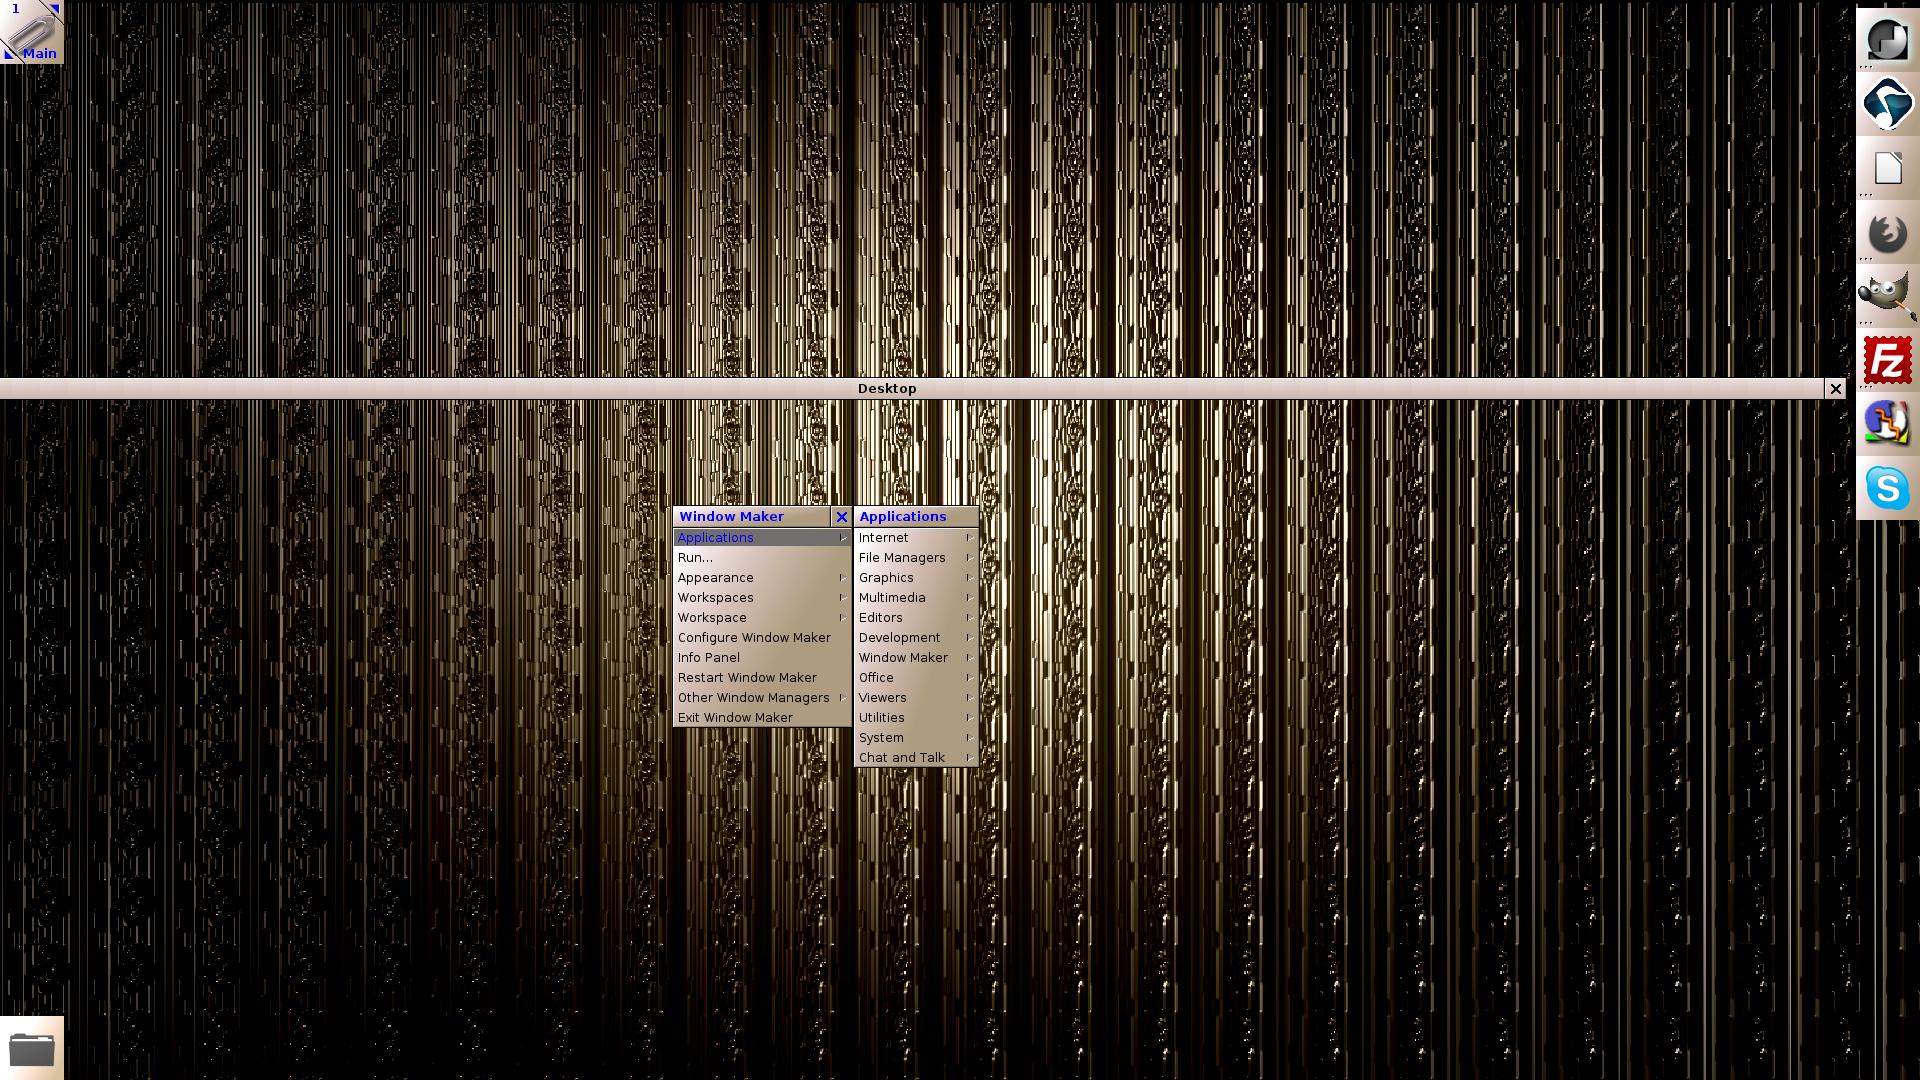 jwm screenshot, jwm screen, jwm linux, jwm themes